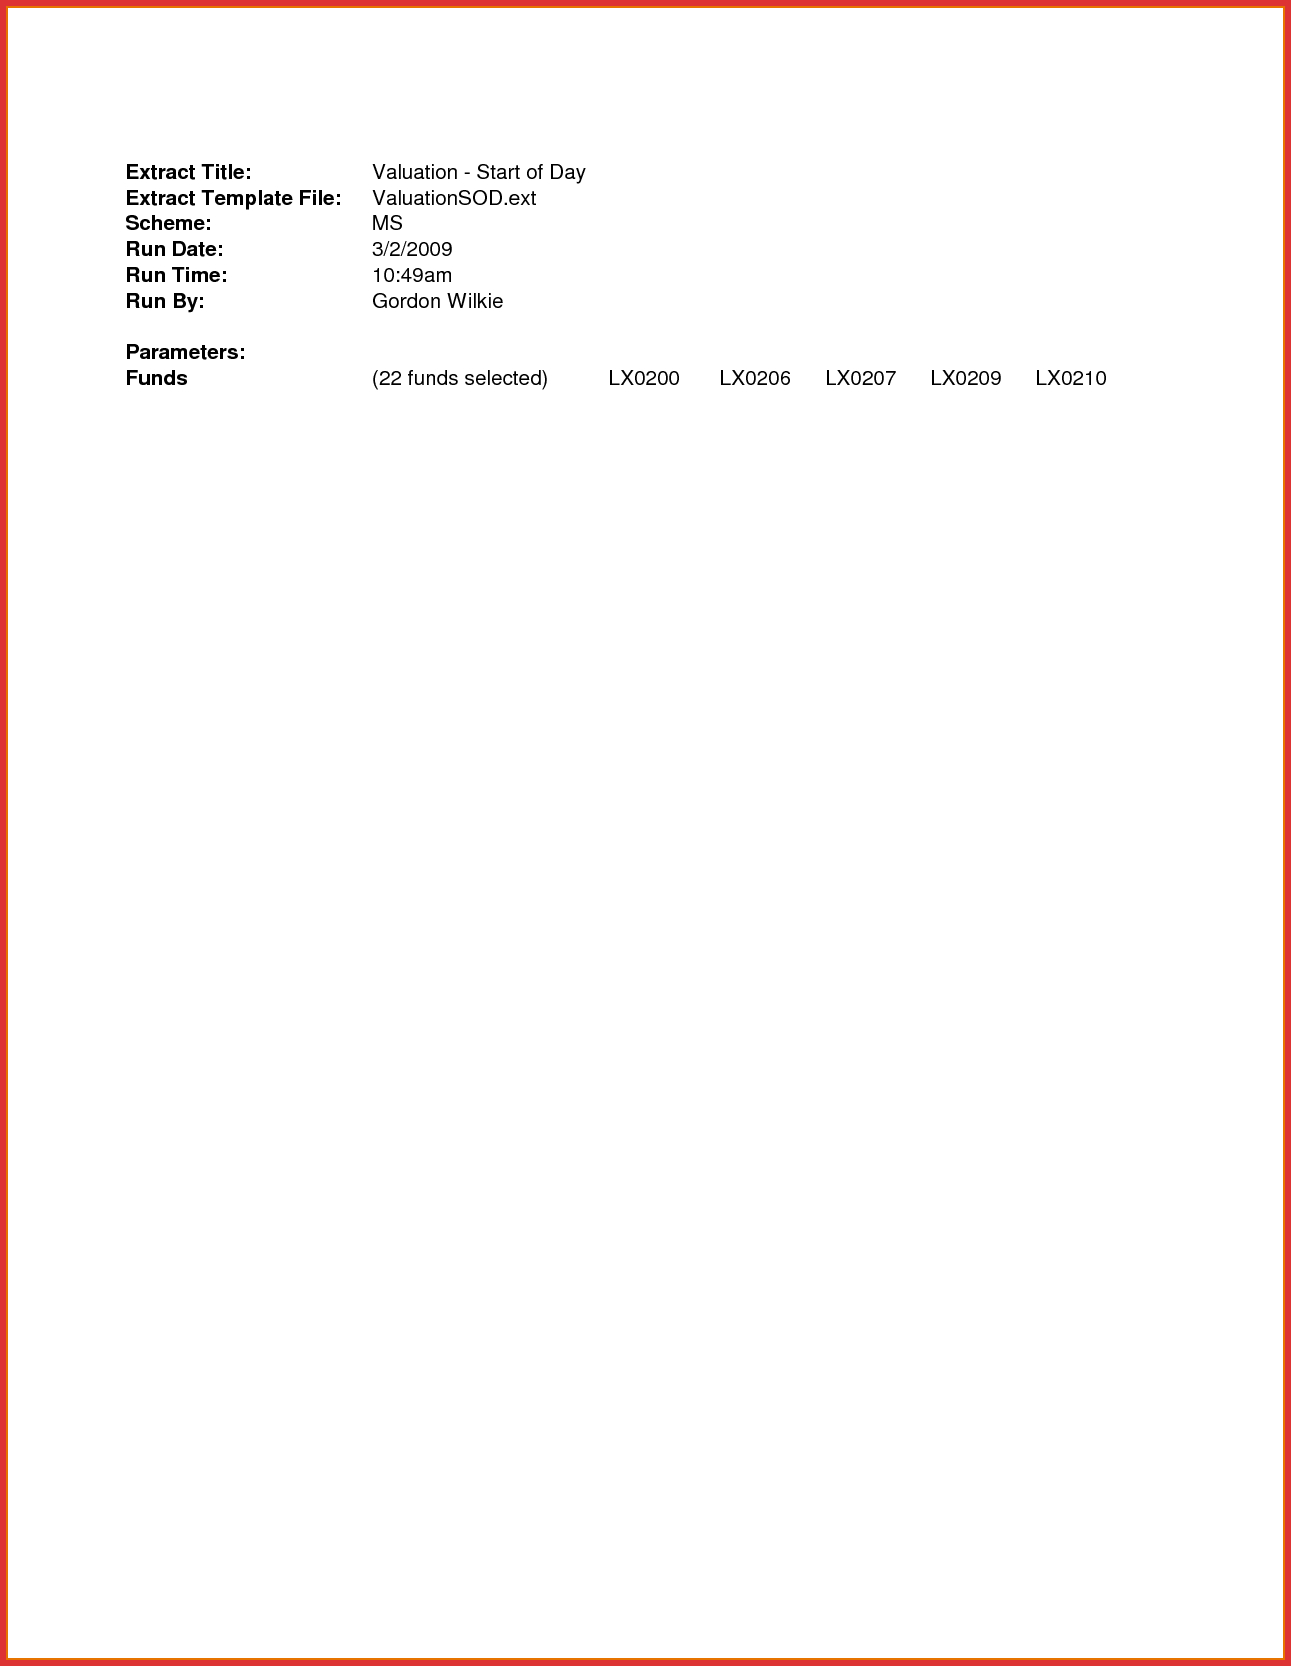 New M Label Templates  Job Latter Regarding 3M Label Templates